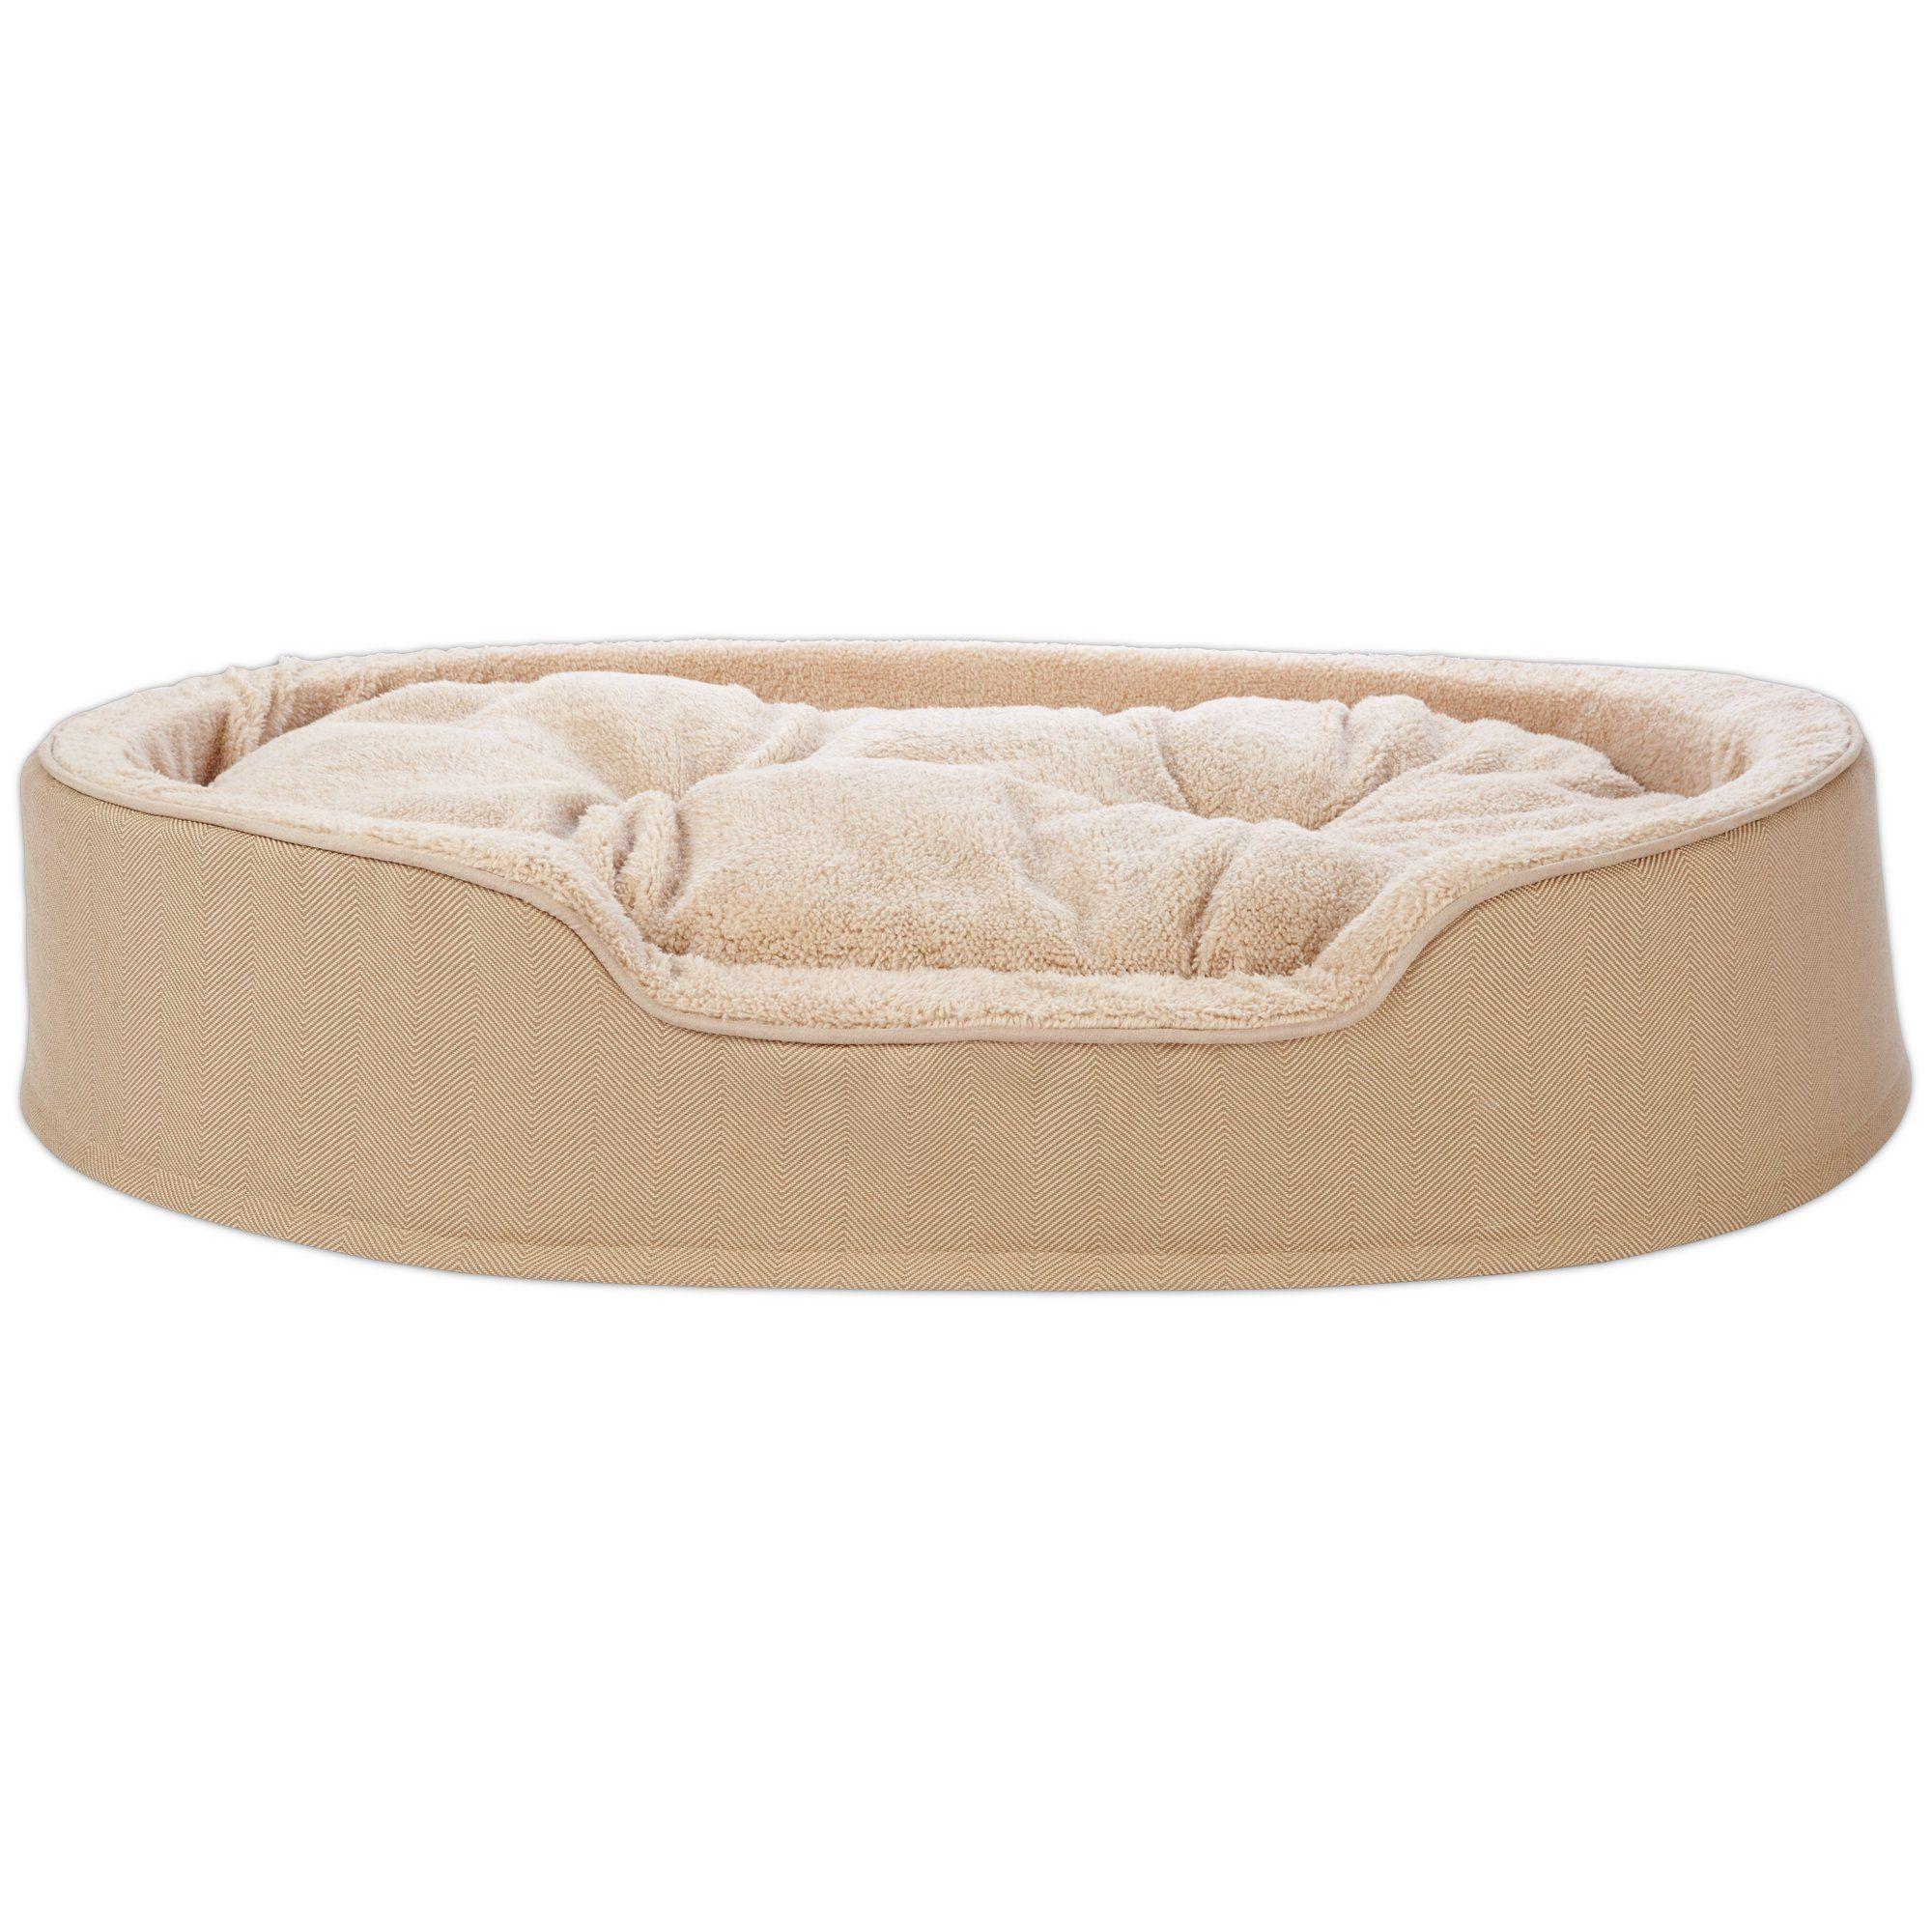 Harmony Cuddler Orthopedic Dog Bed In Khaki 43 L X 27 W